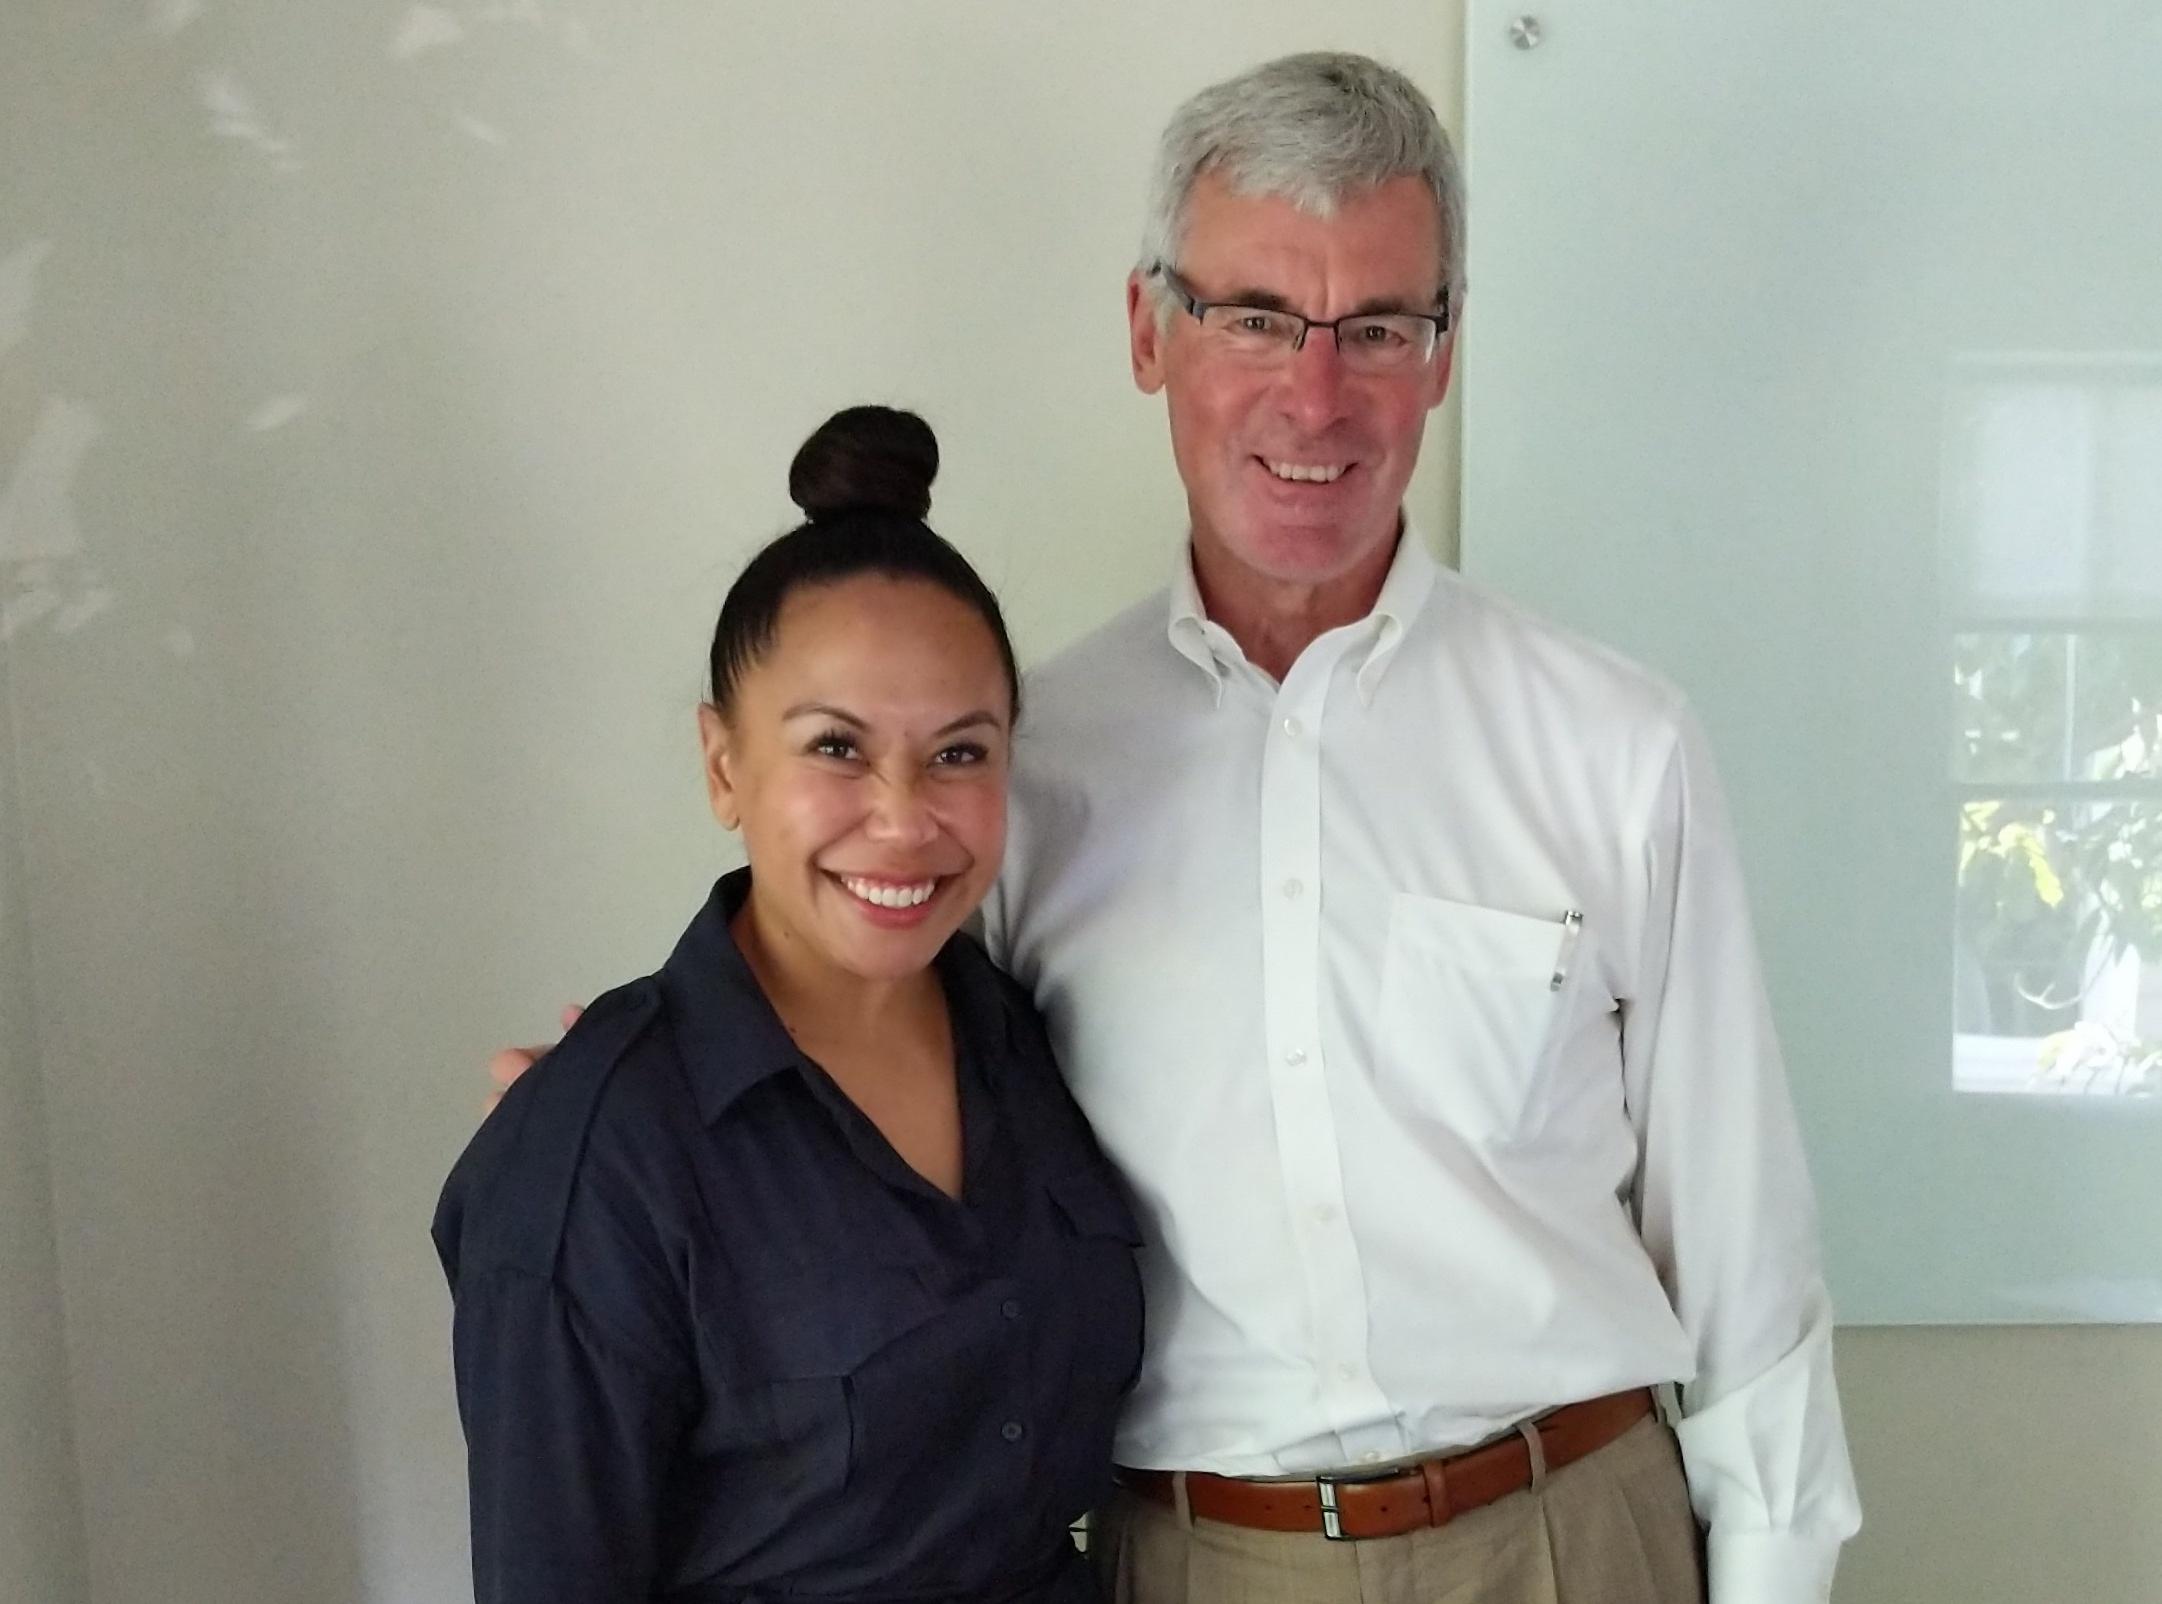 Evegail Andal and Jon Pfeiffer